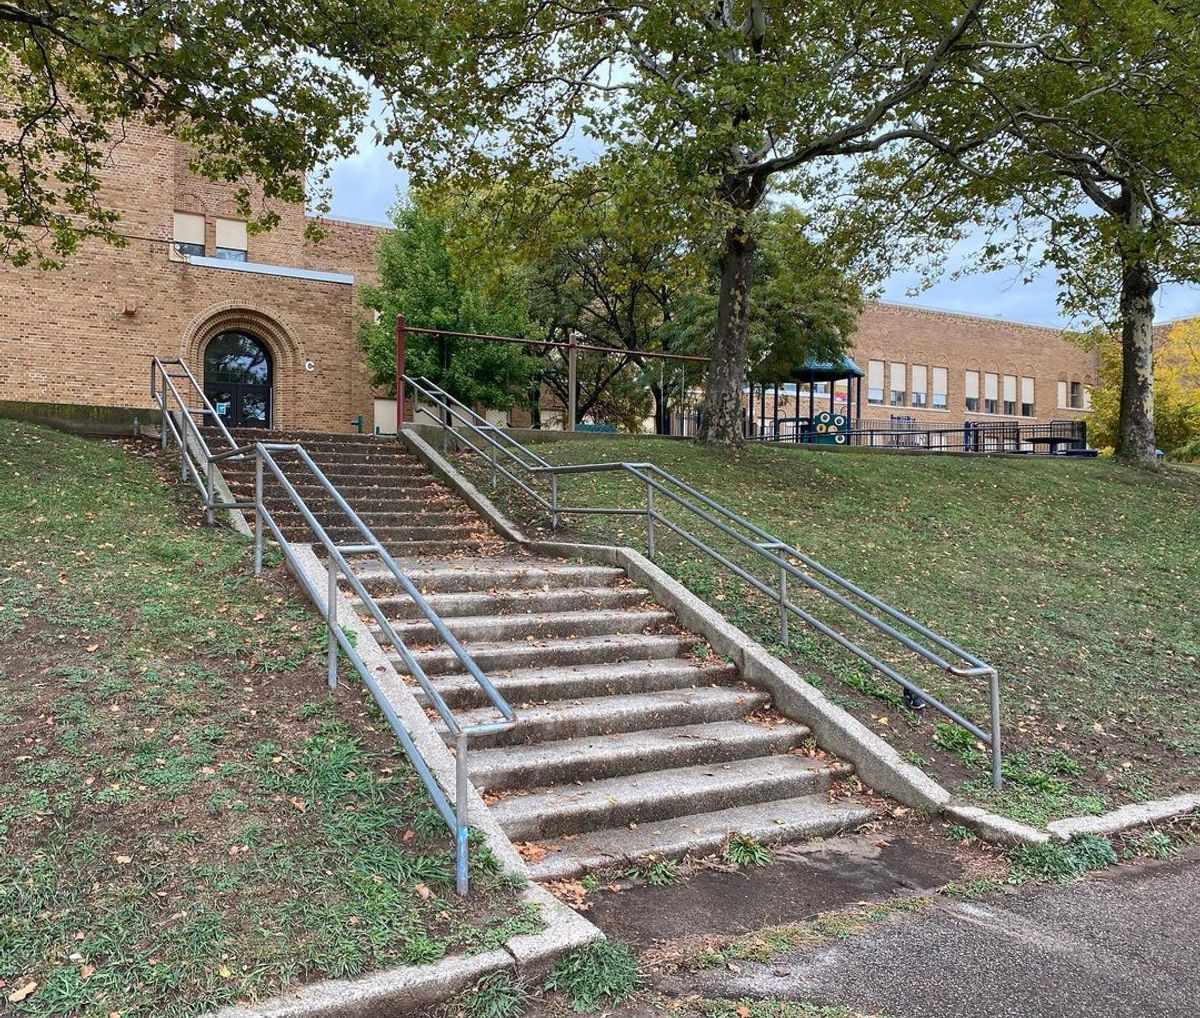 Image for skate spot Aberdeen School - Double Set Rail